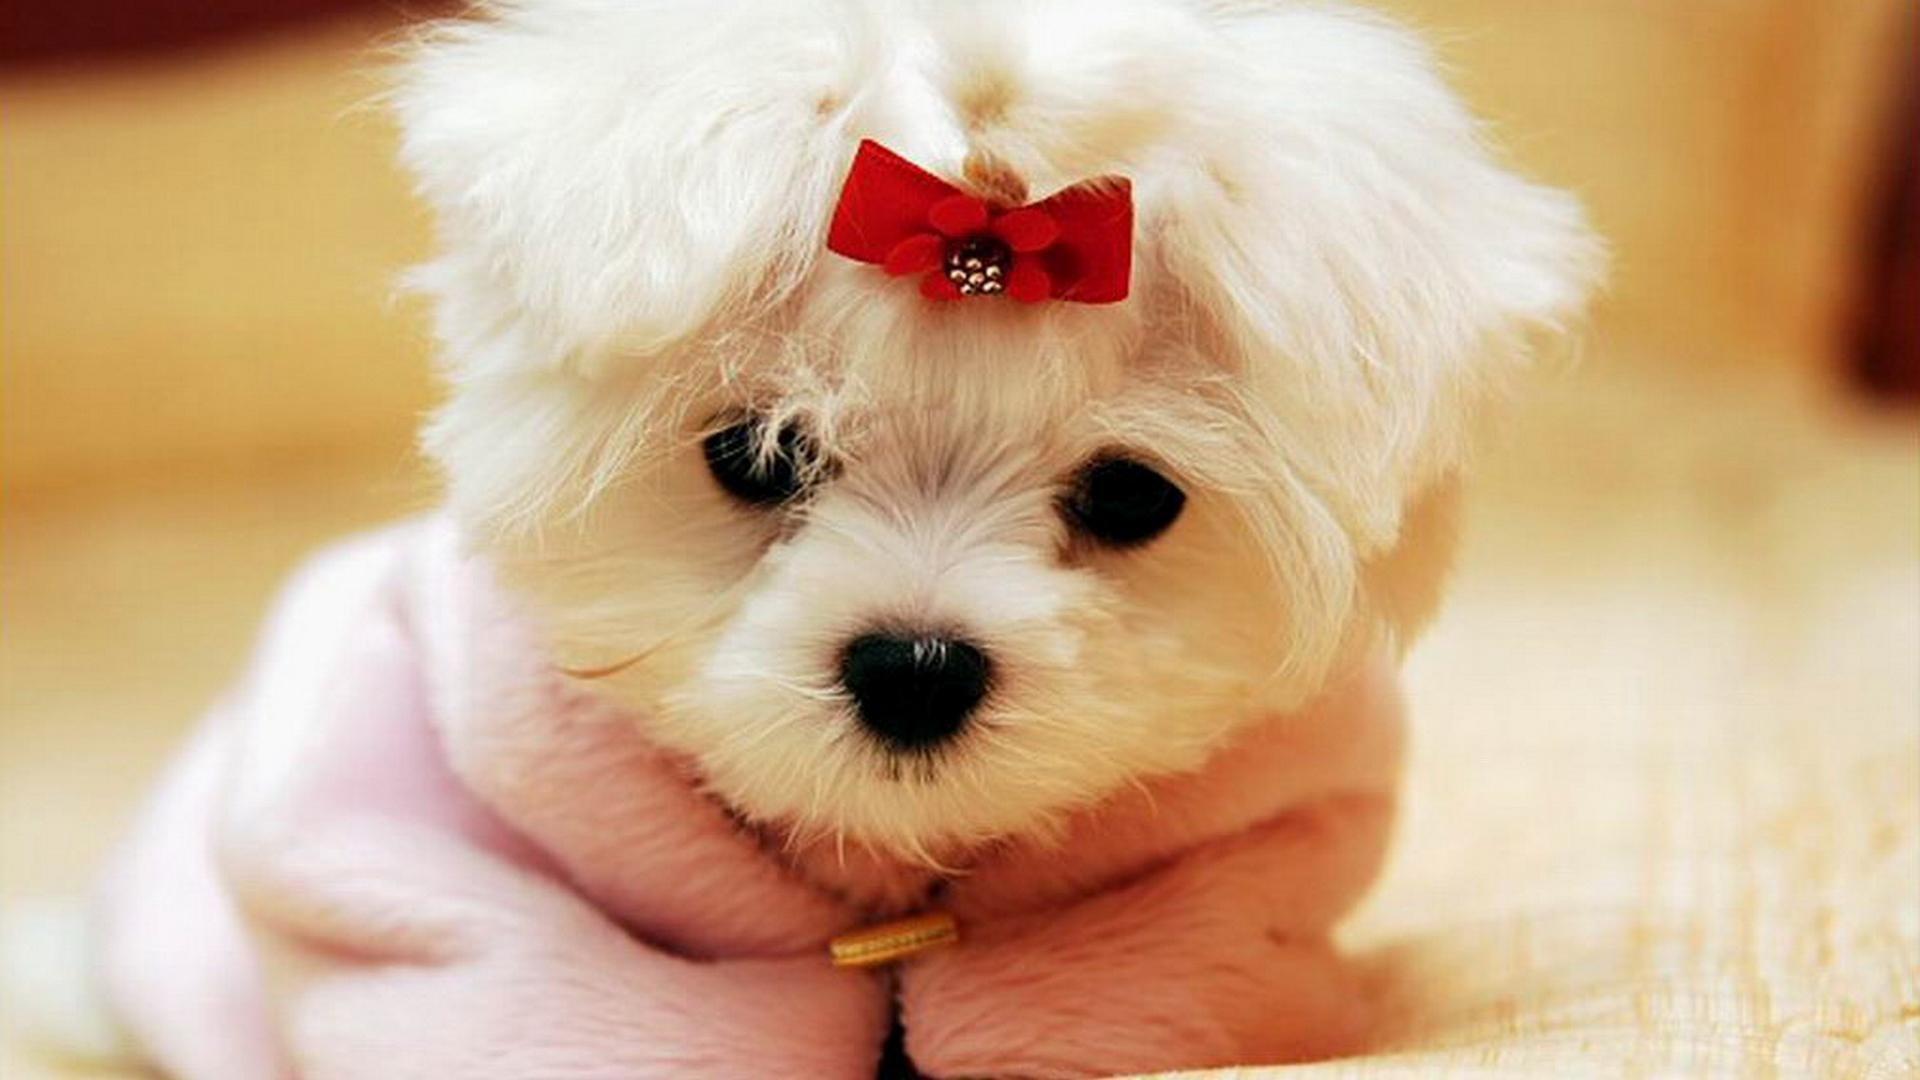 6. cute-dog-wallpapers-HD6-600×338